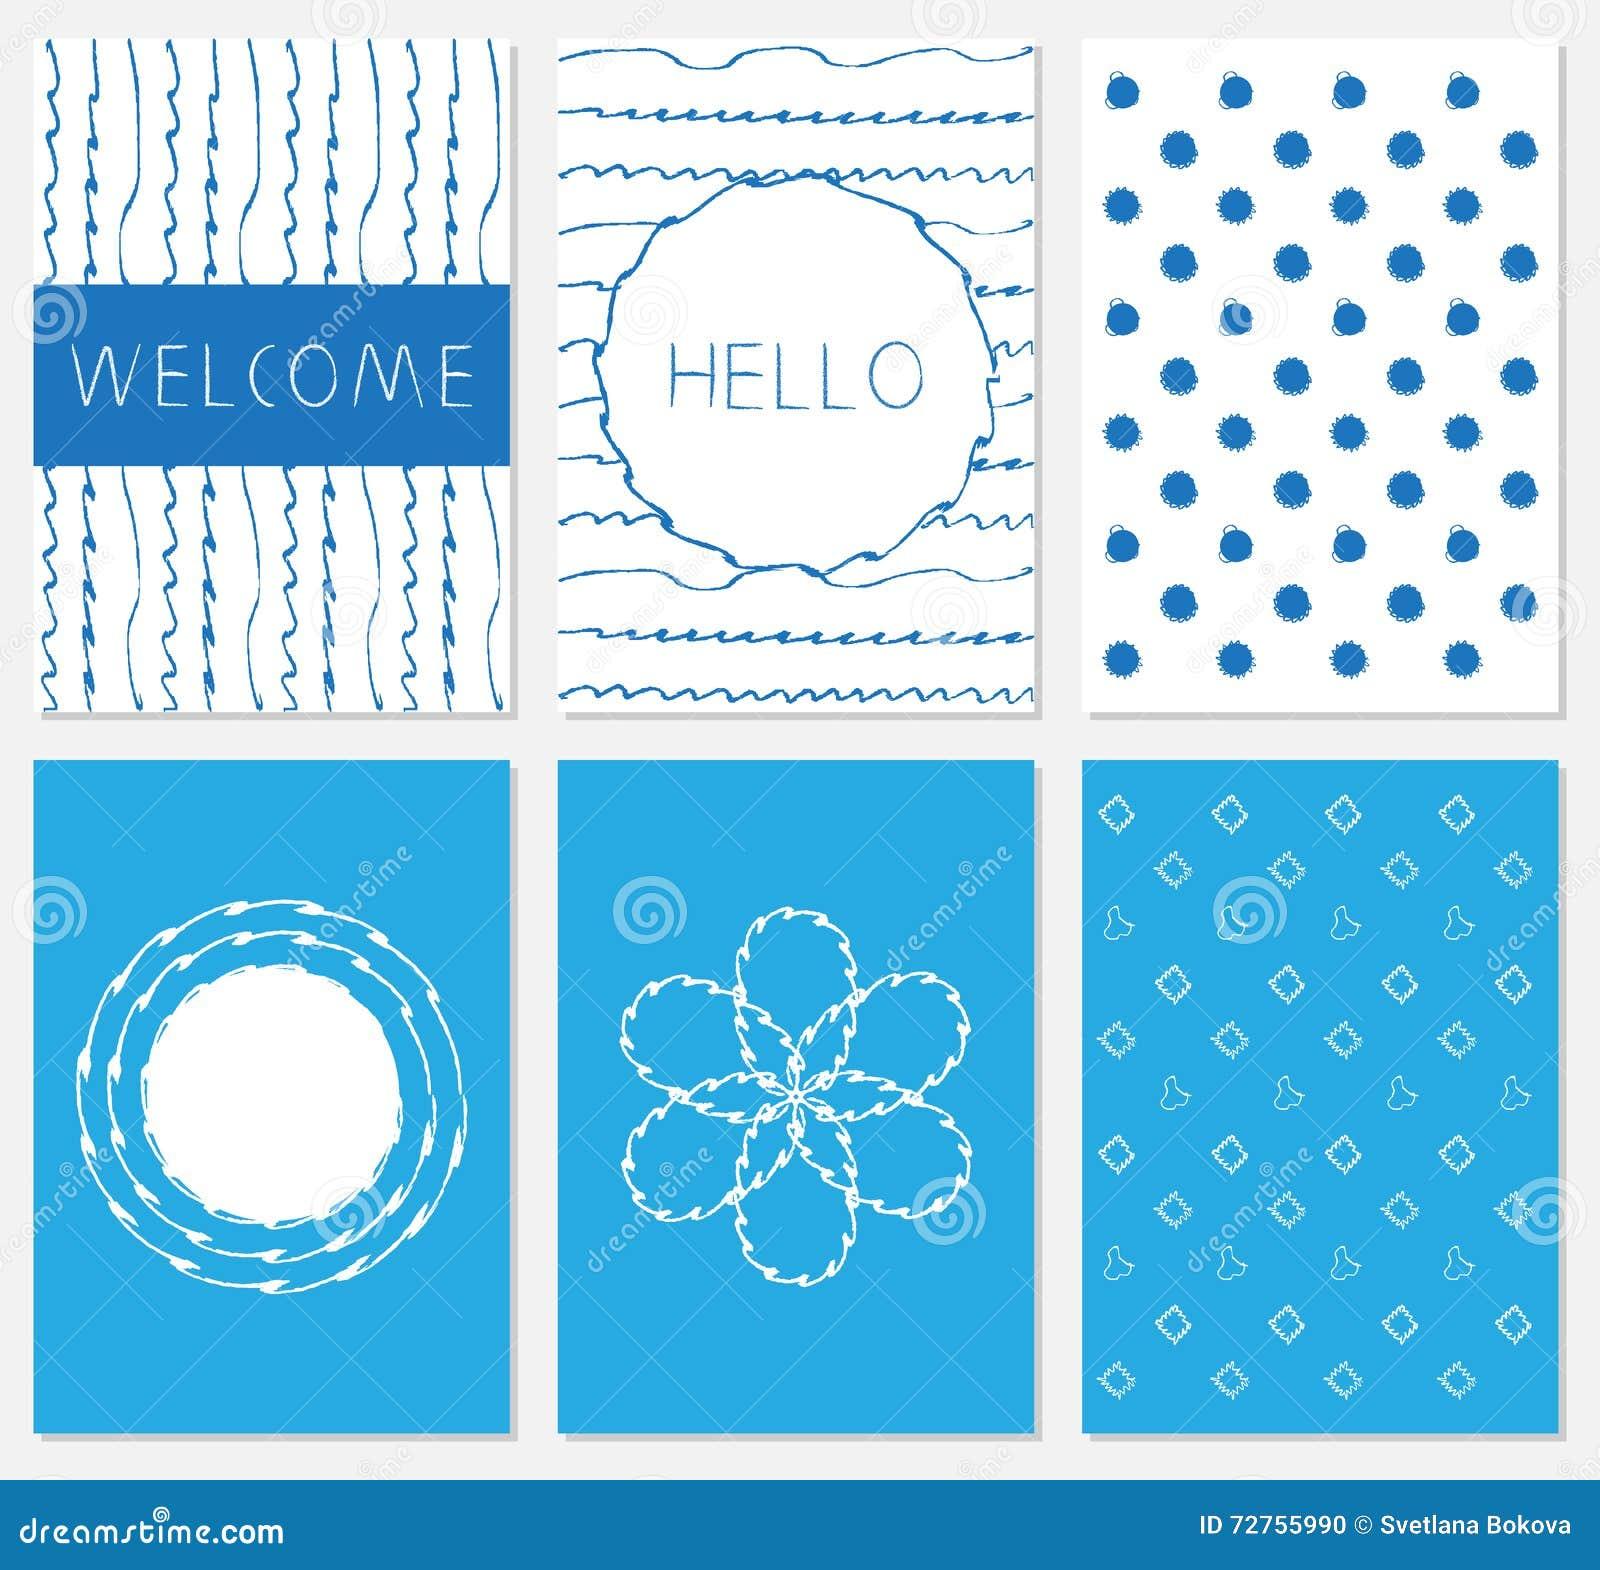 Vector set of design templates